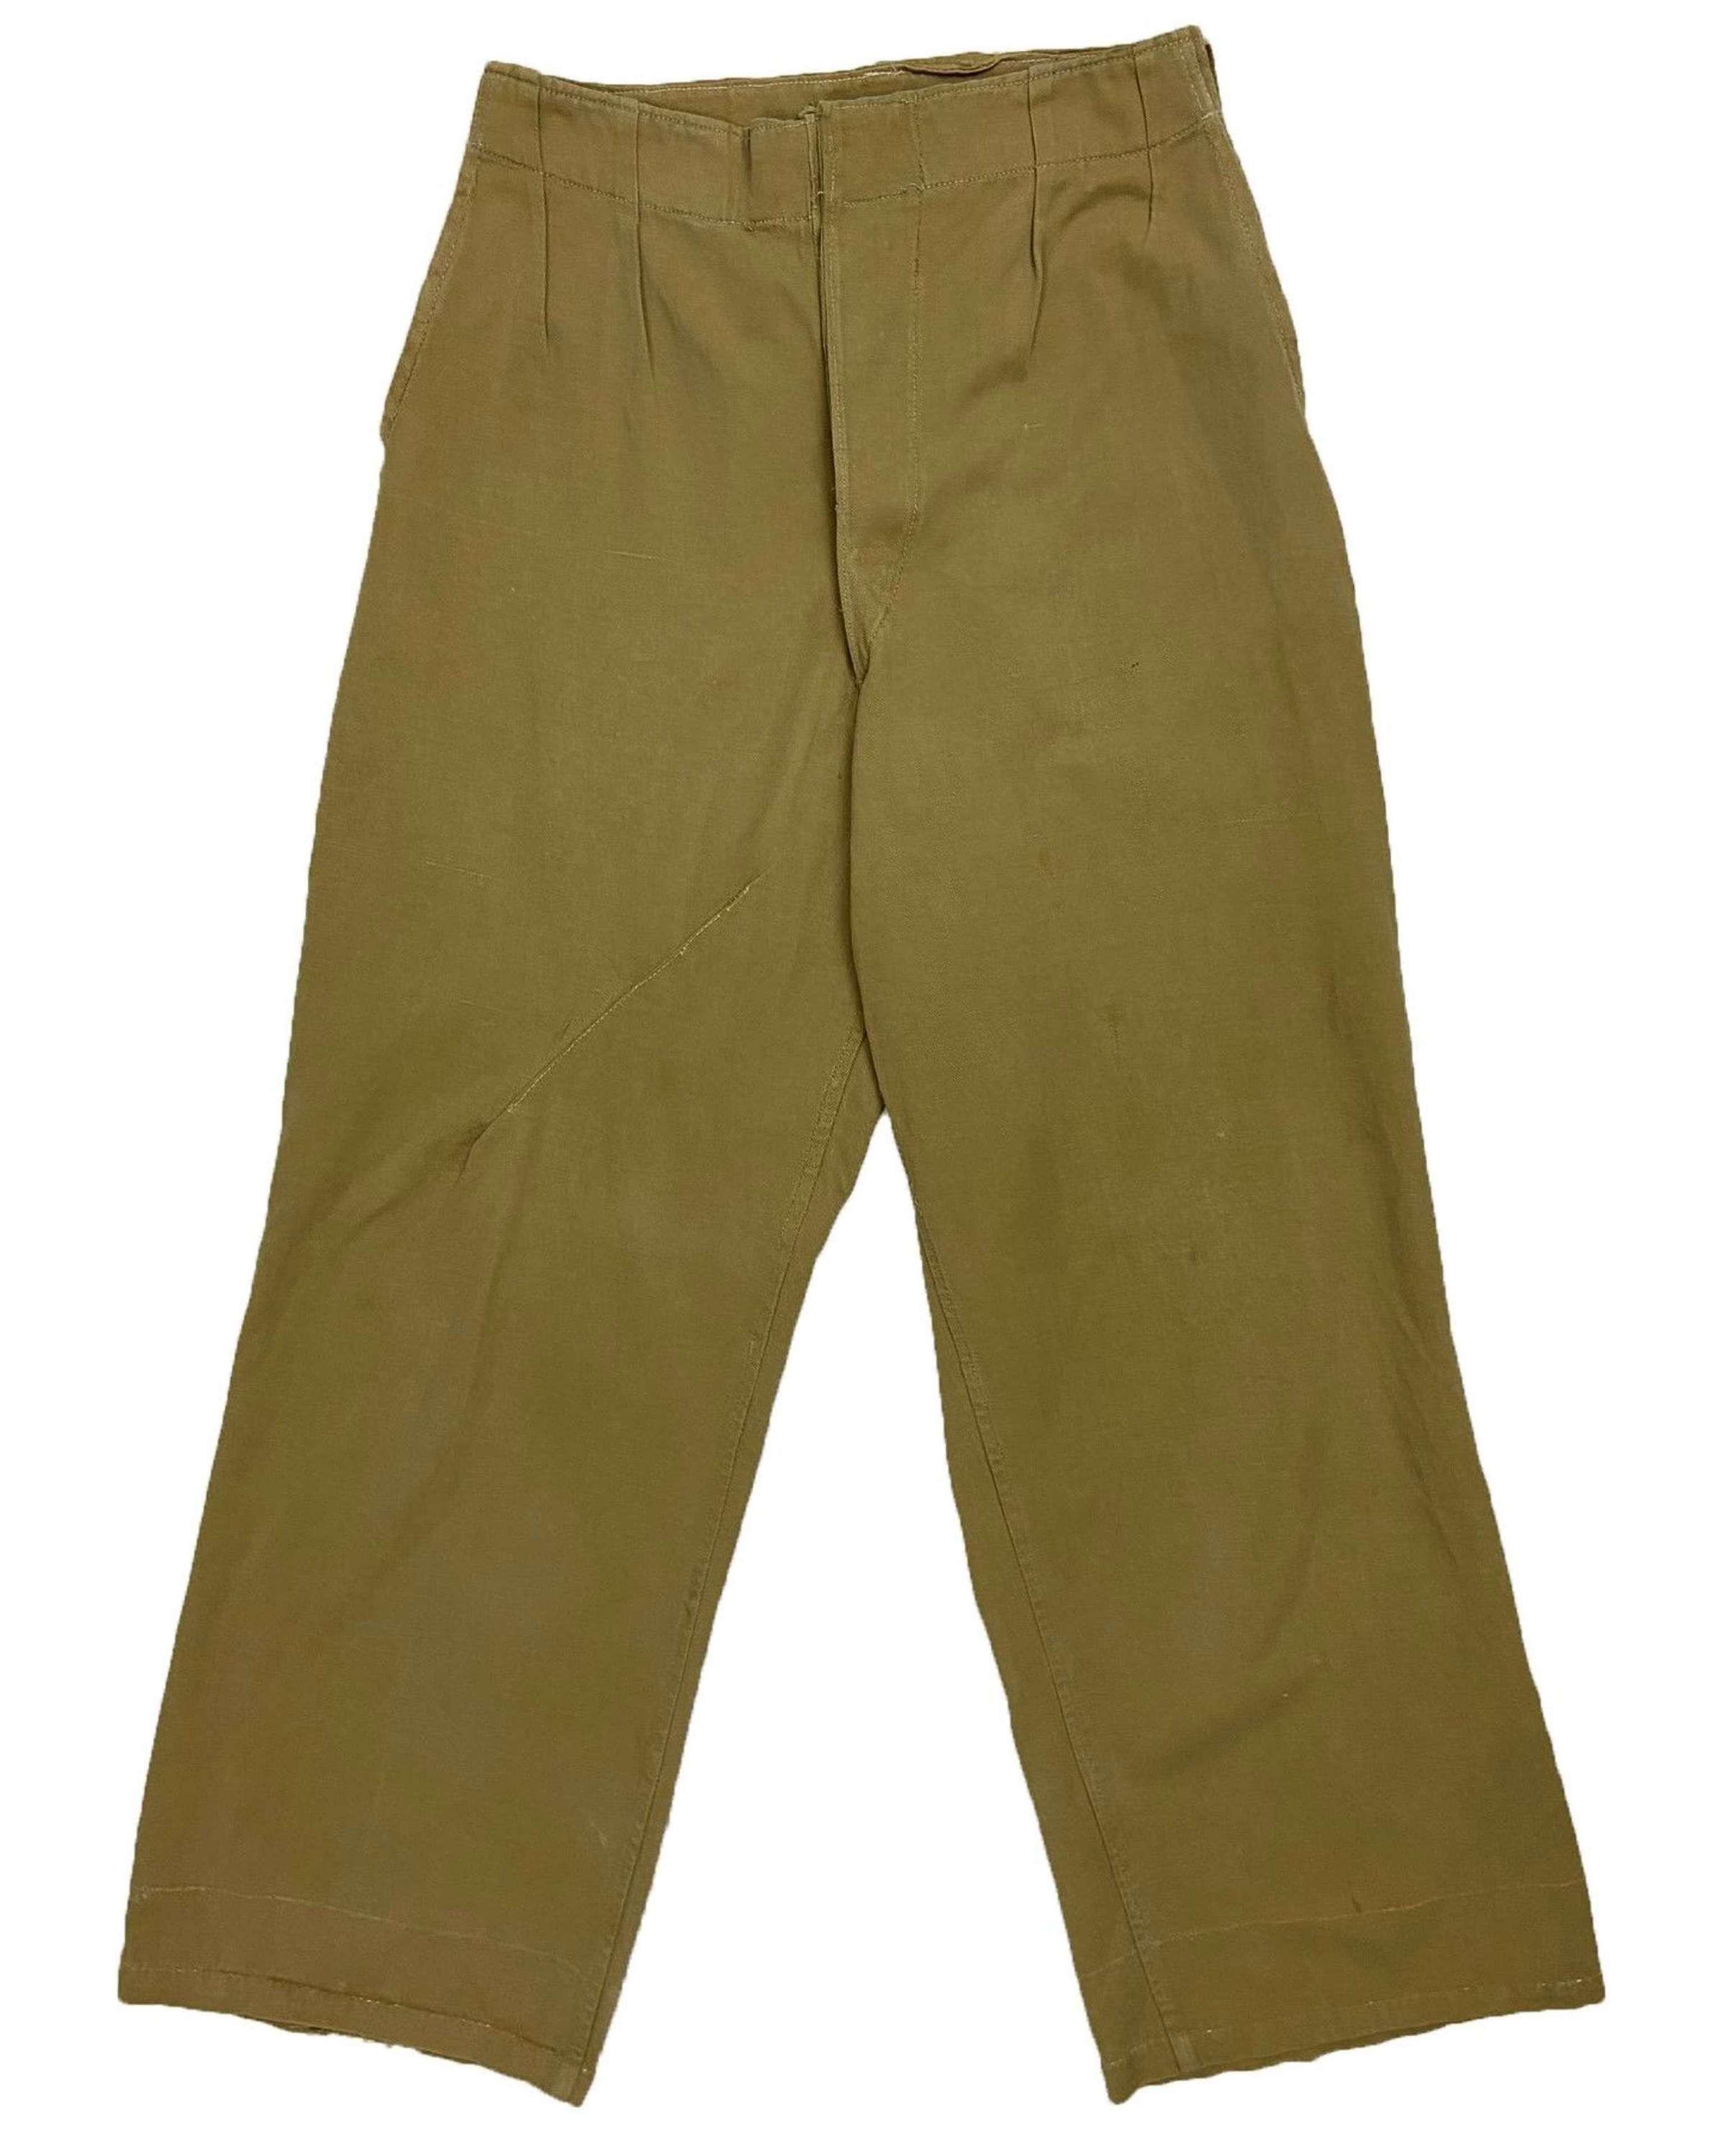 Original 1943 Dated Indian Made British Khaki Drill Trousers